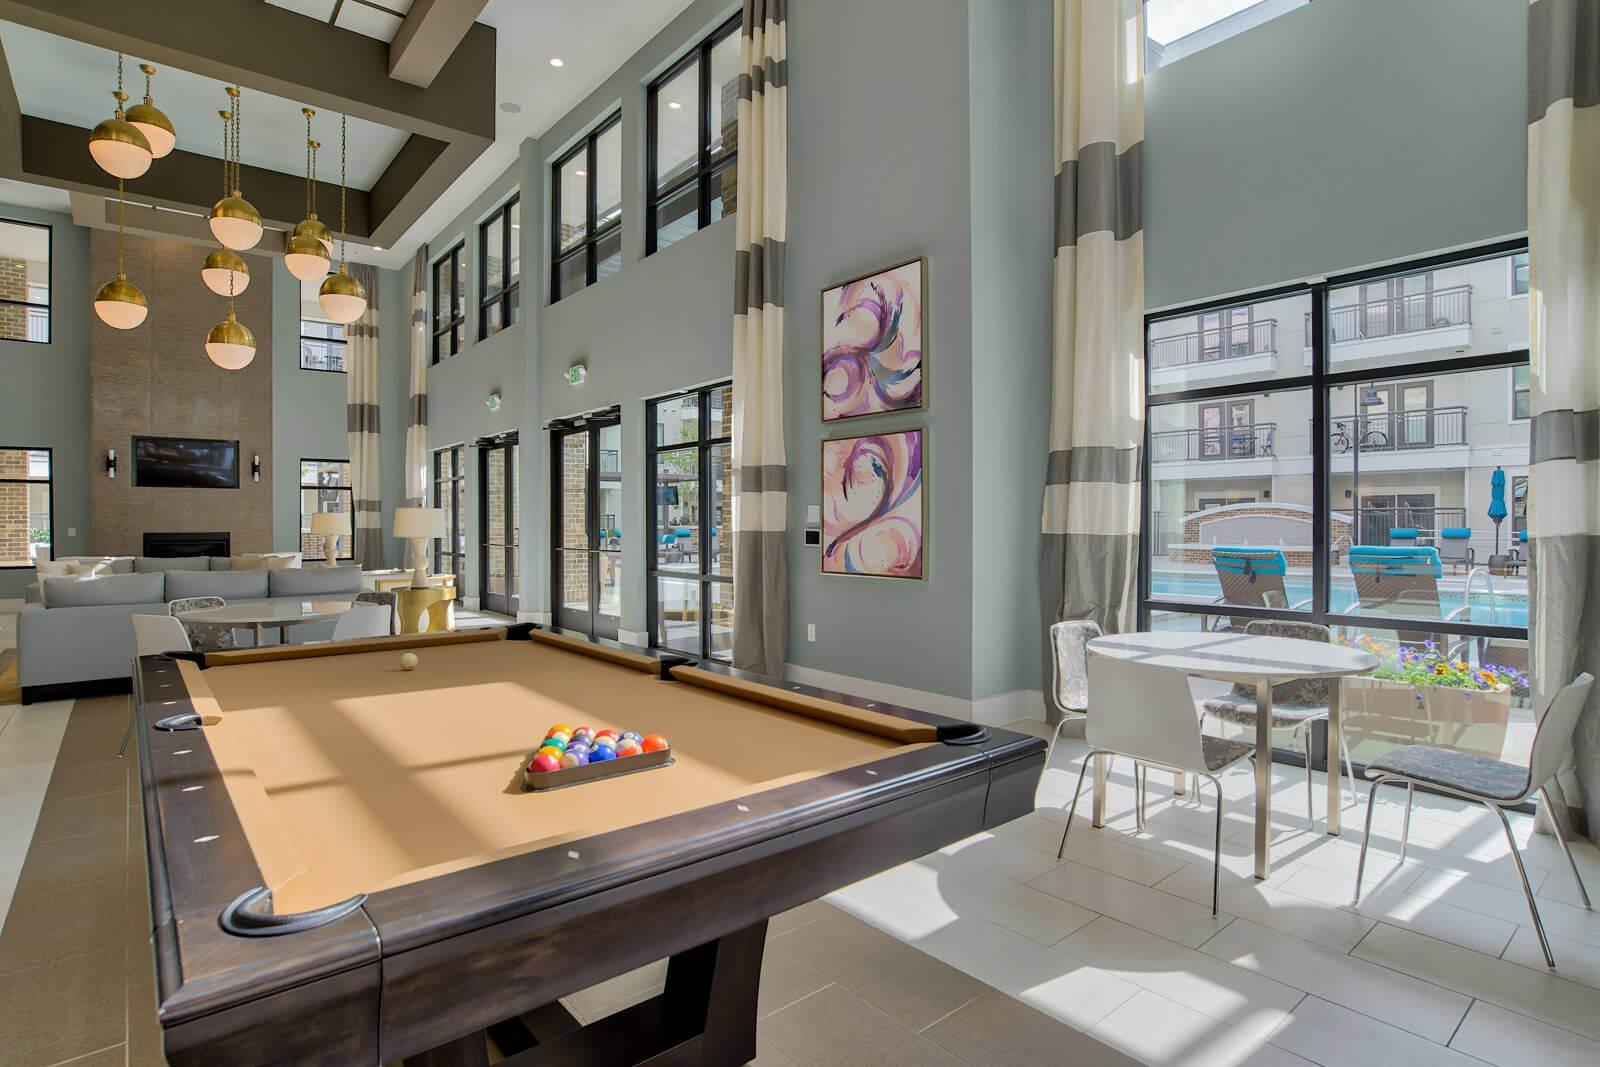 Billiards Table in Entertainment Lounge at Windsor Old Fourth Ward, Atlanta, Georgia